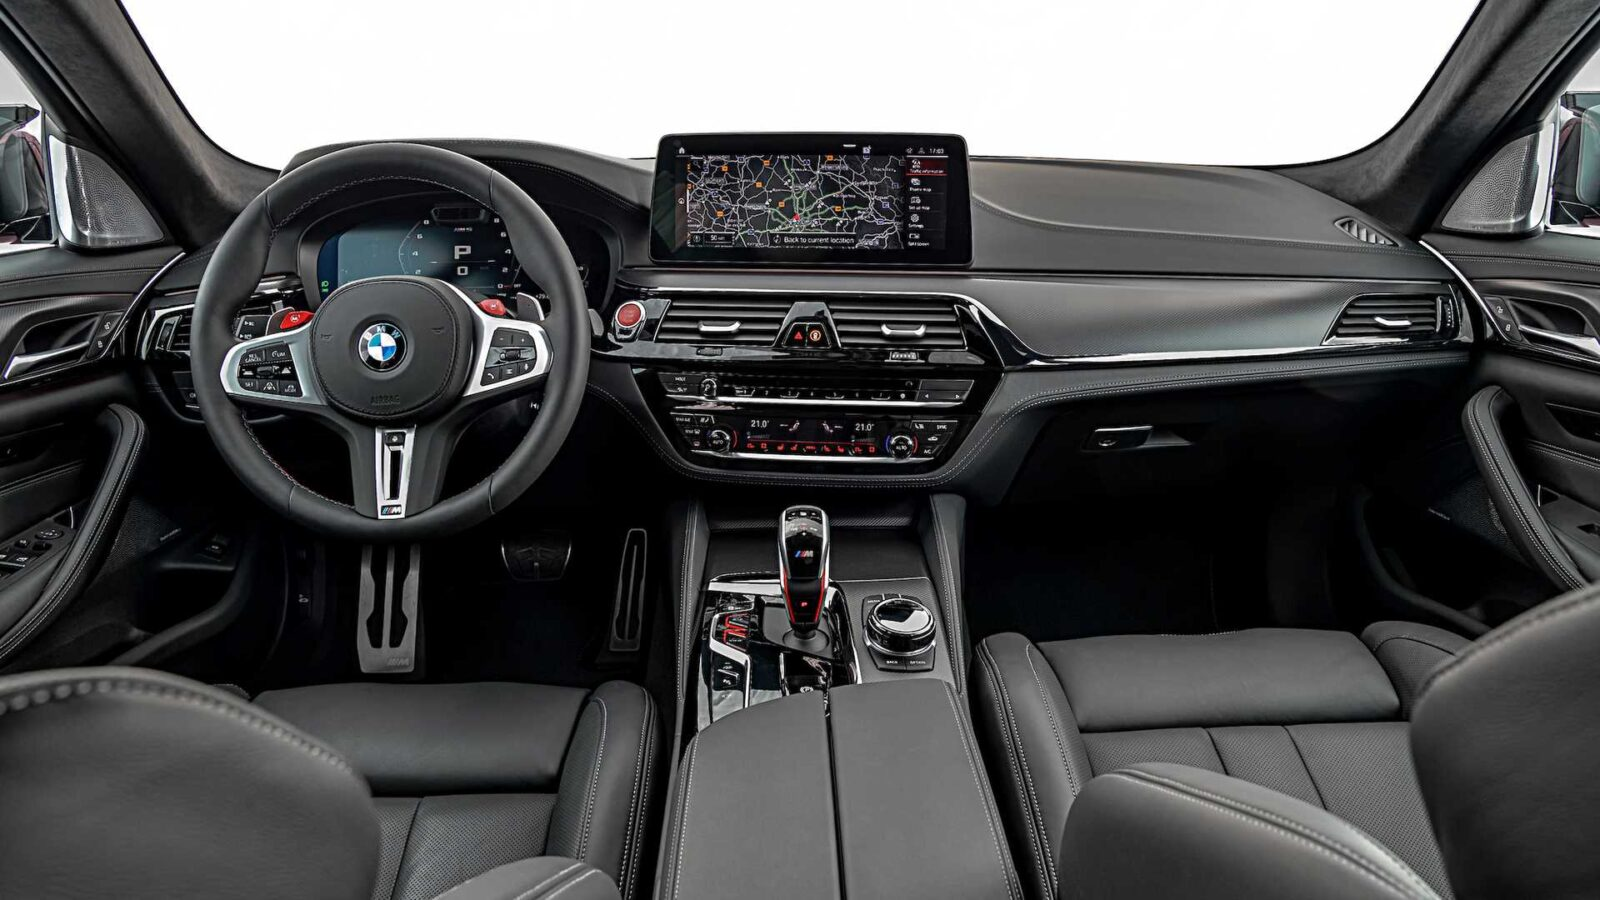 Салон BMW M5 2021 модельного года